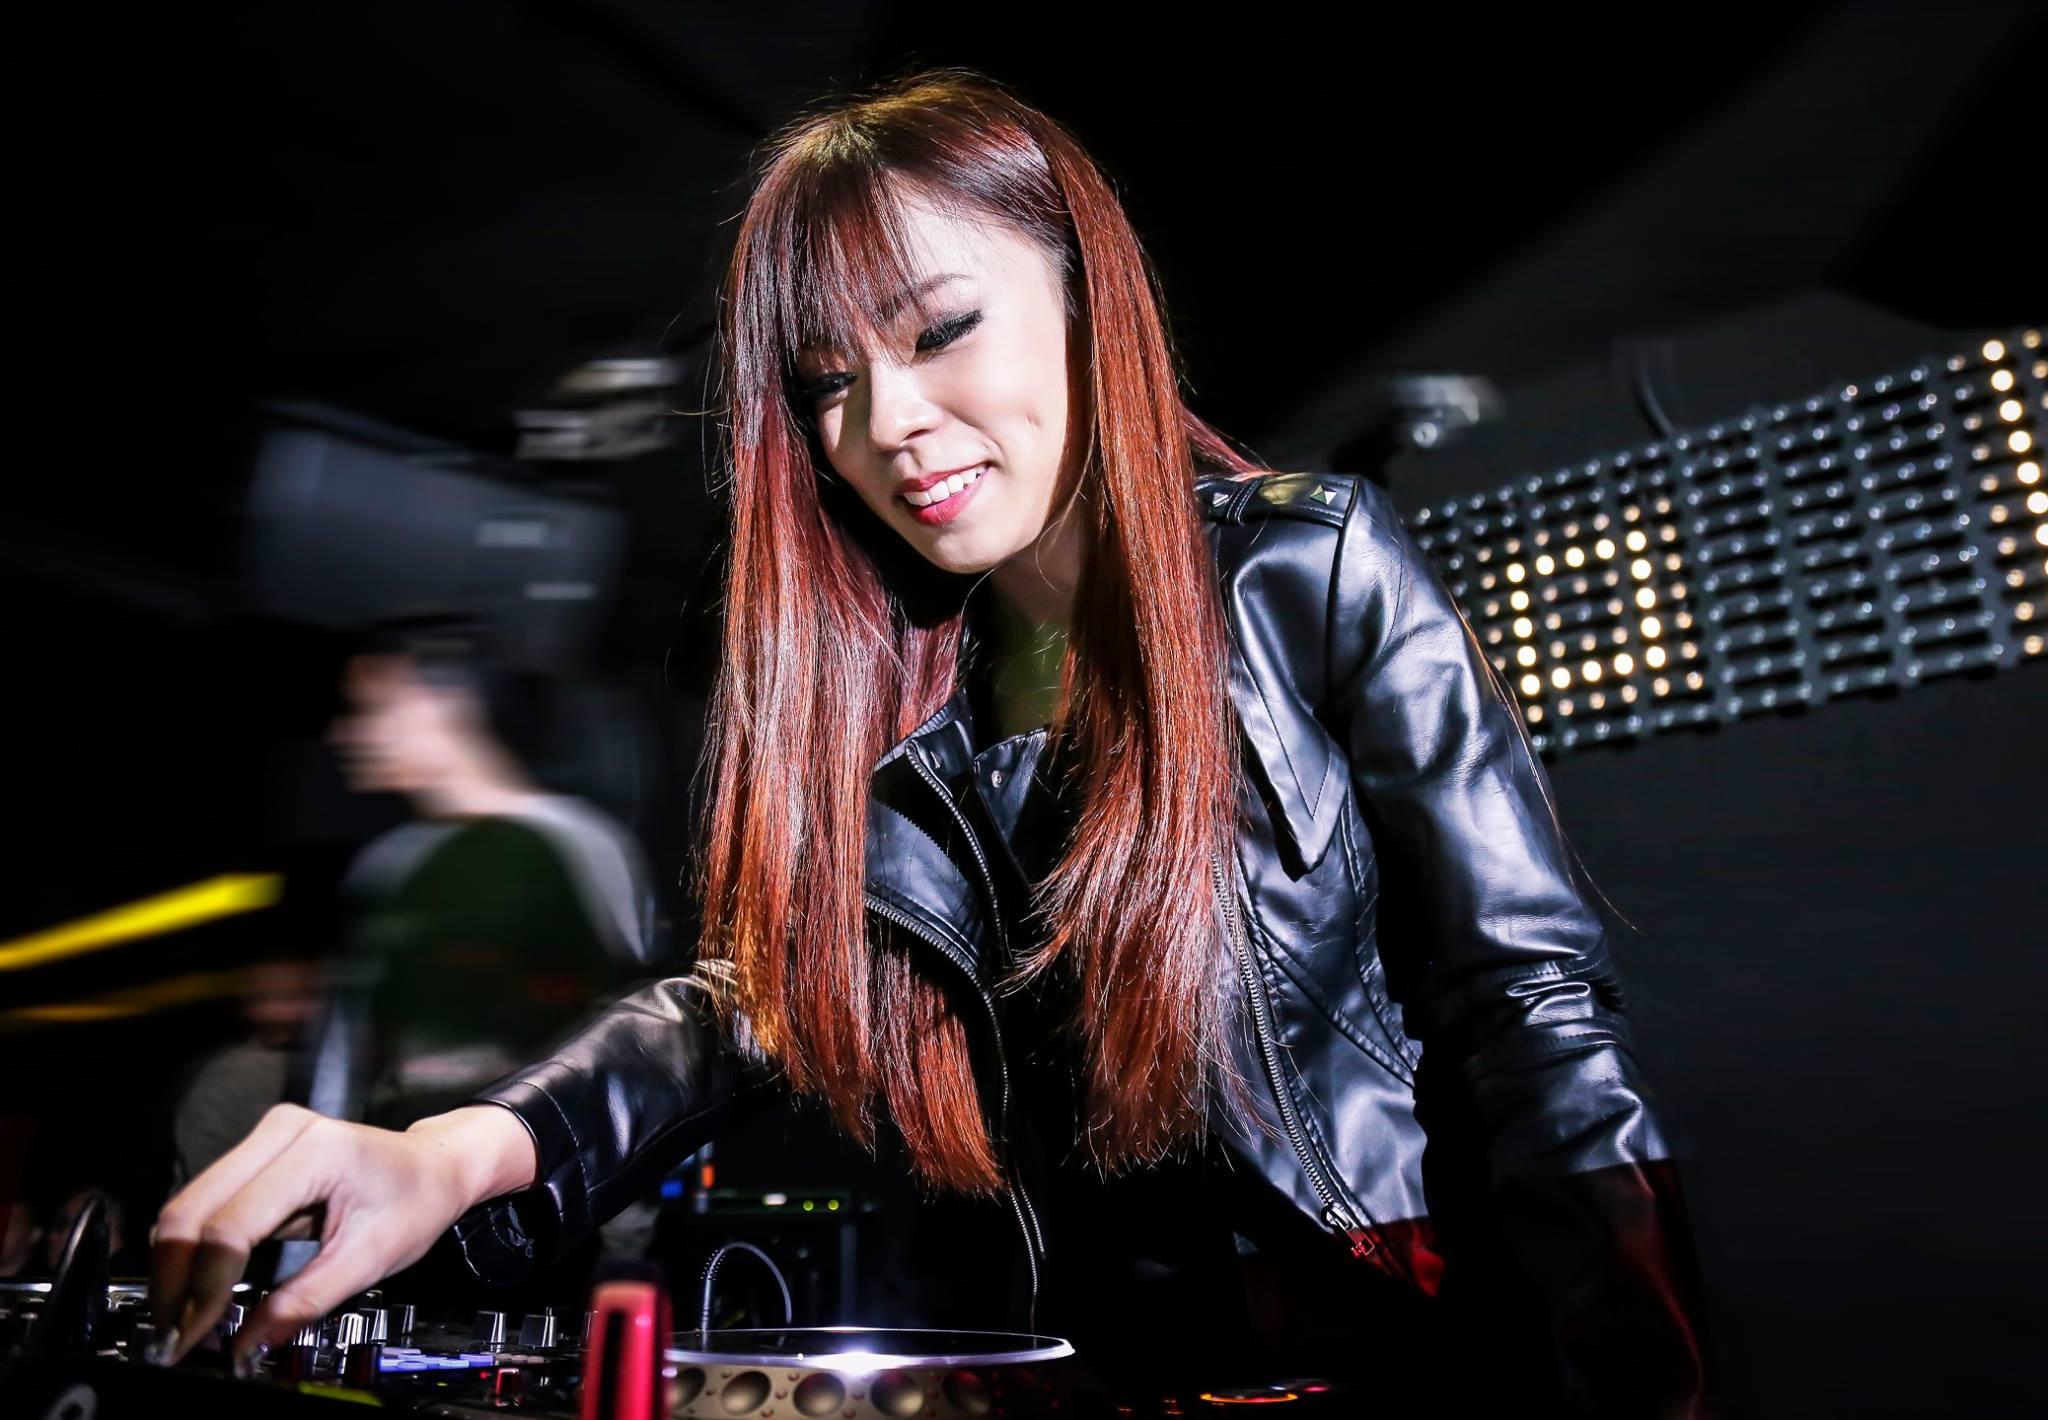 DJ Photoshoot KL